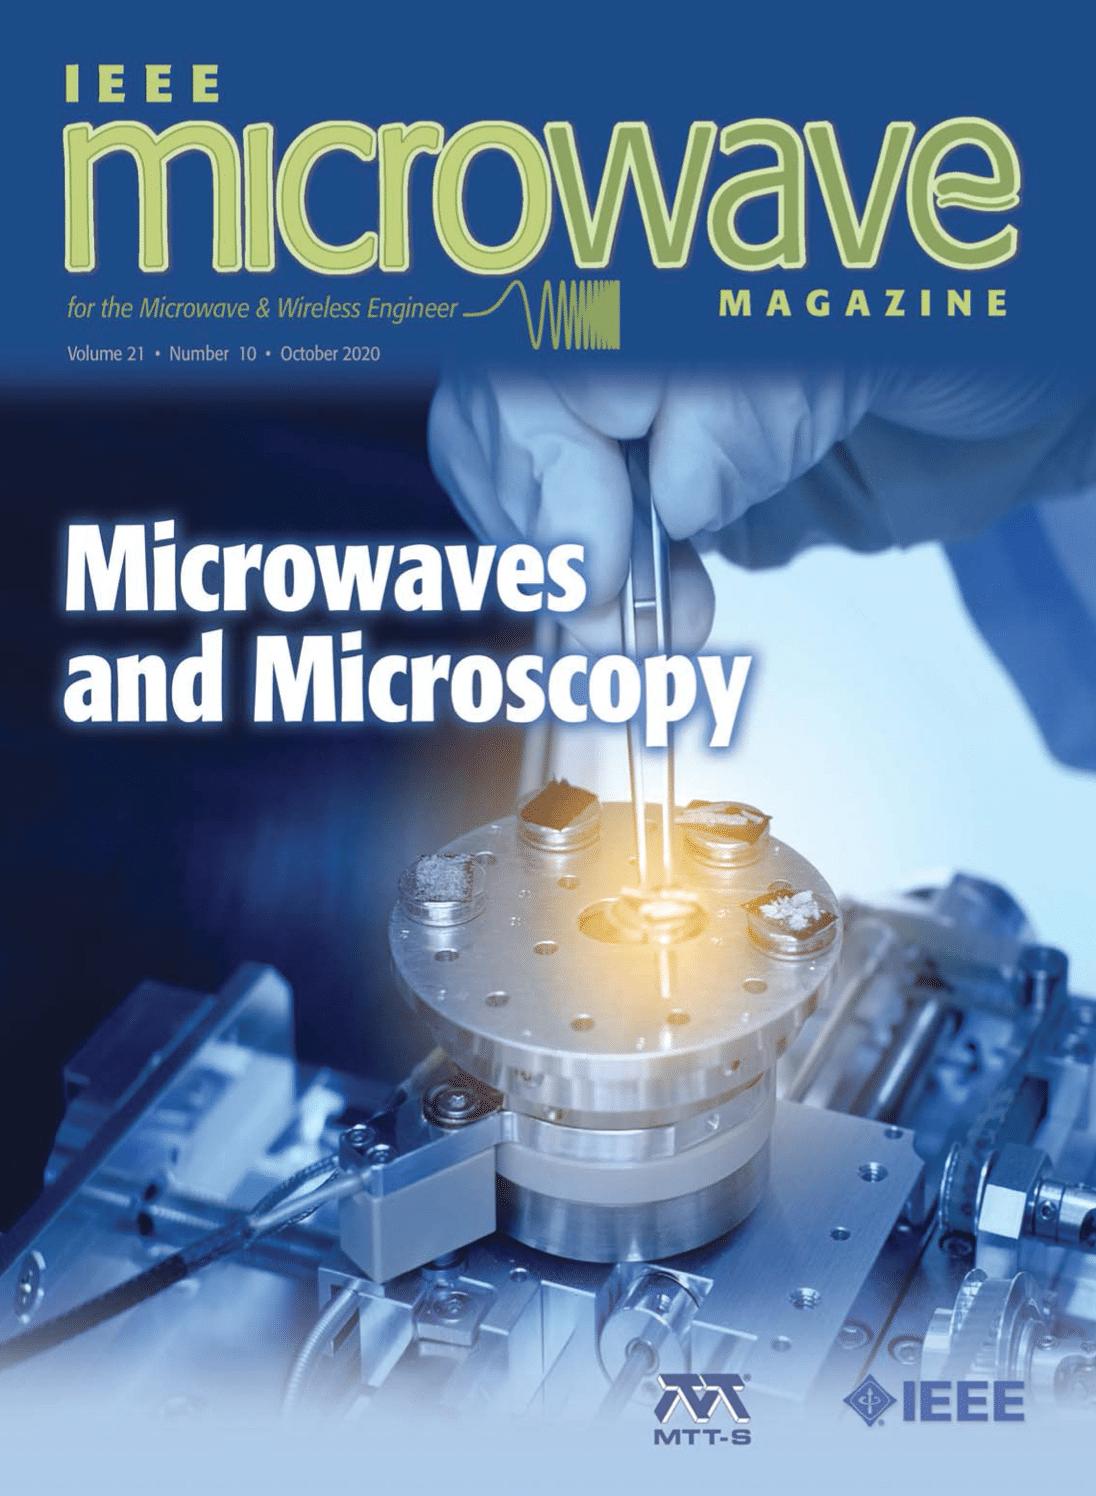 Microwave Magazine October 2020 - MTT-S